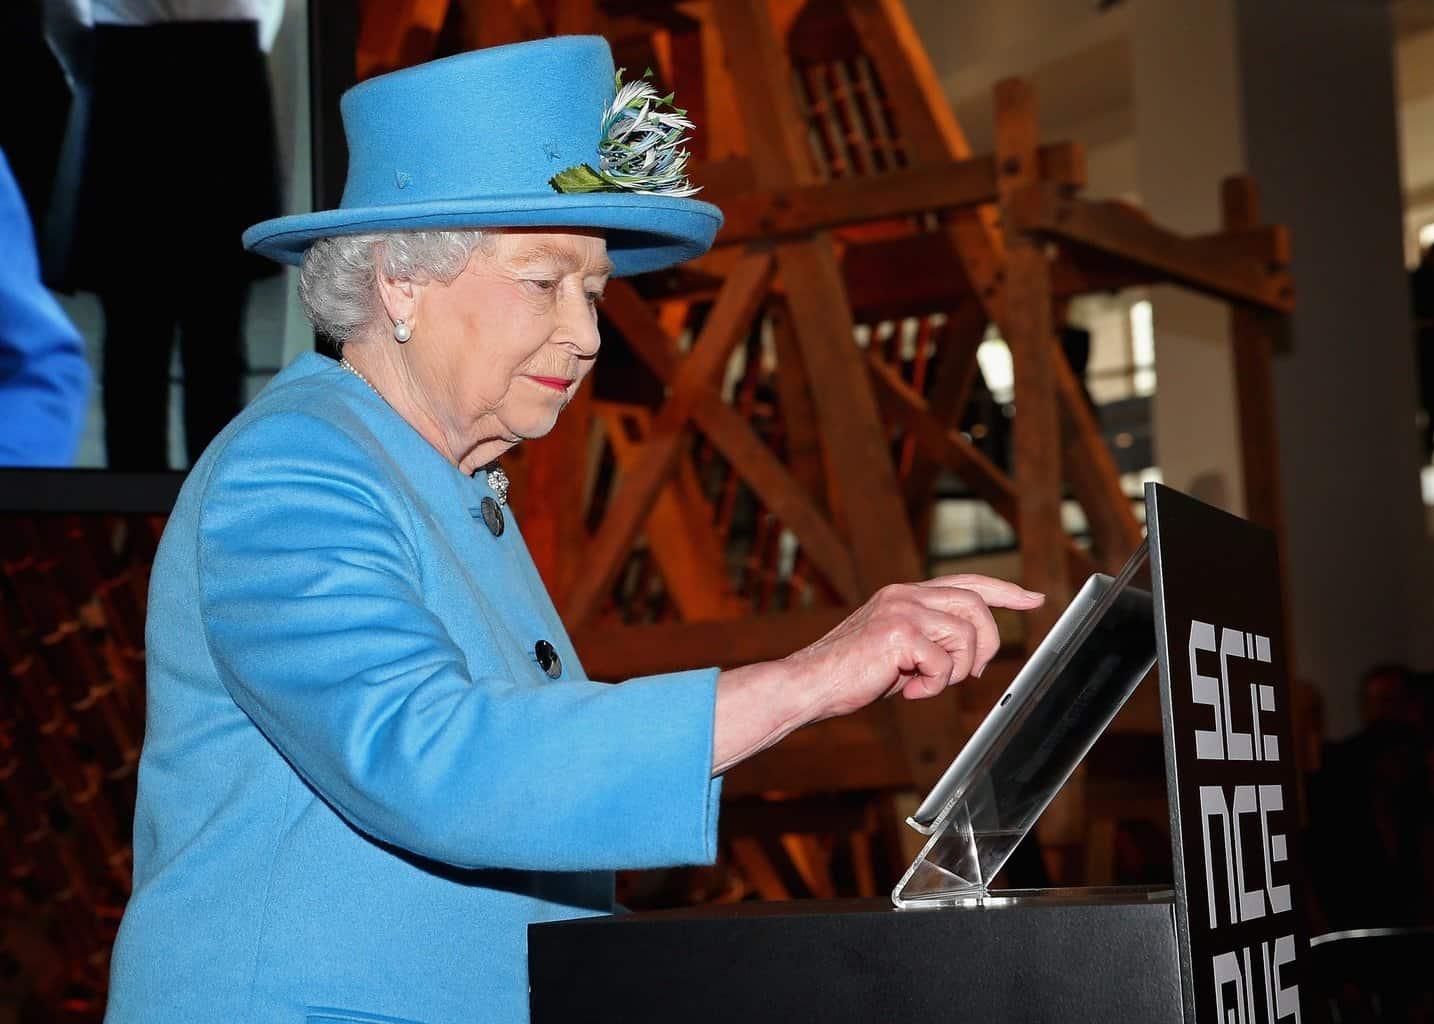 BRITAIN-ROYALS-TECHNOLOGY